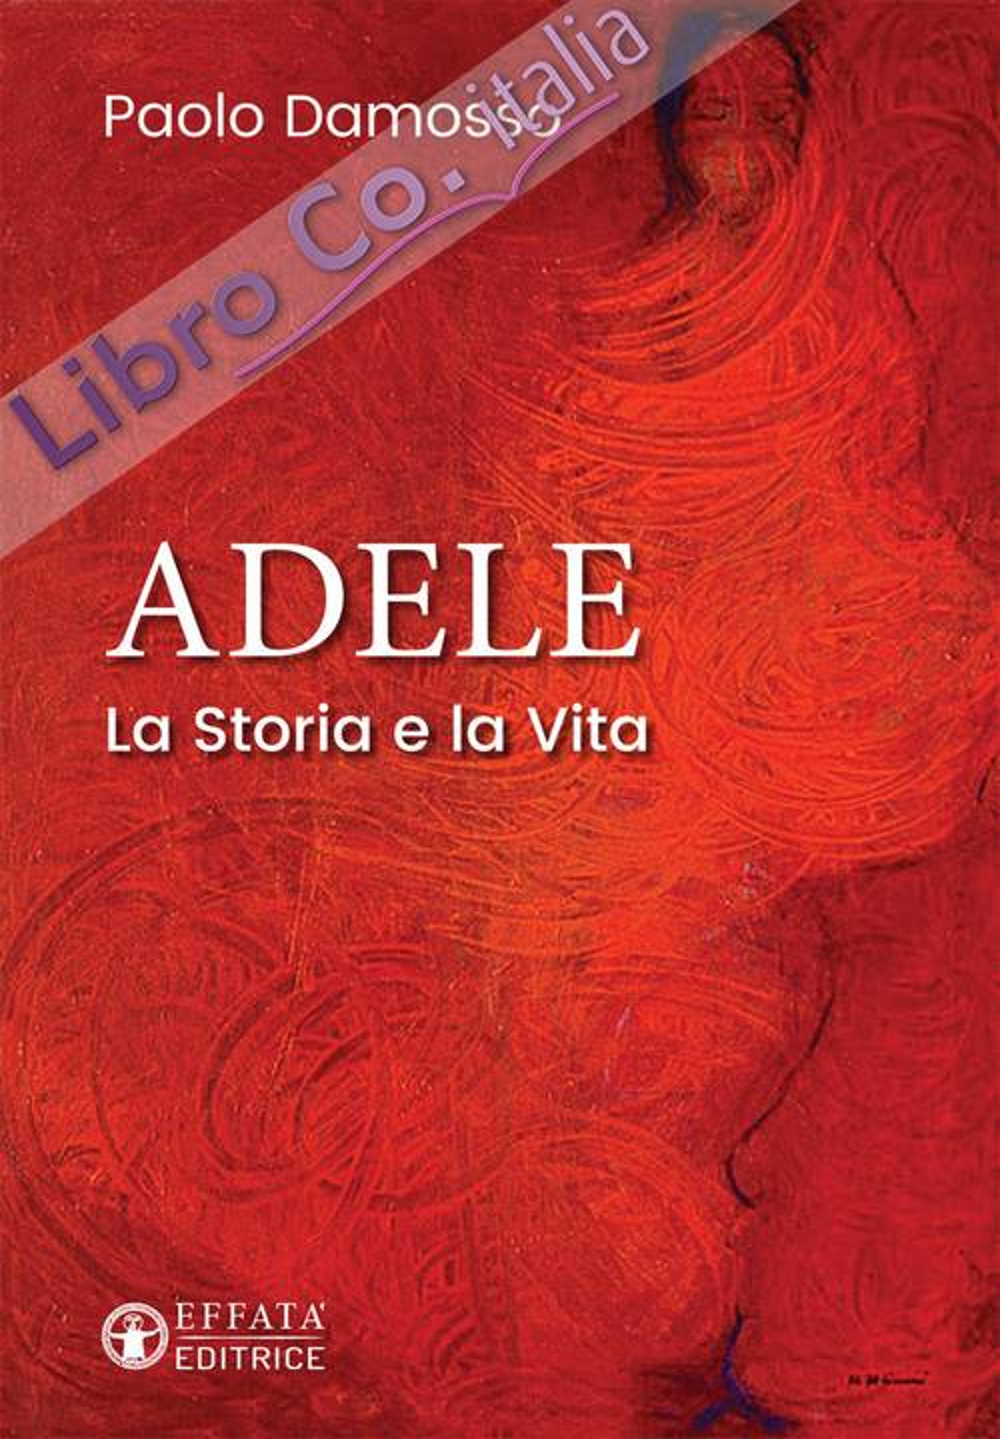 Adele. La storia e la vita.